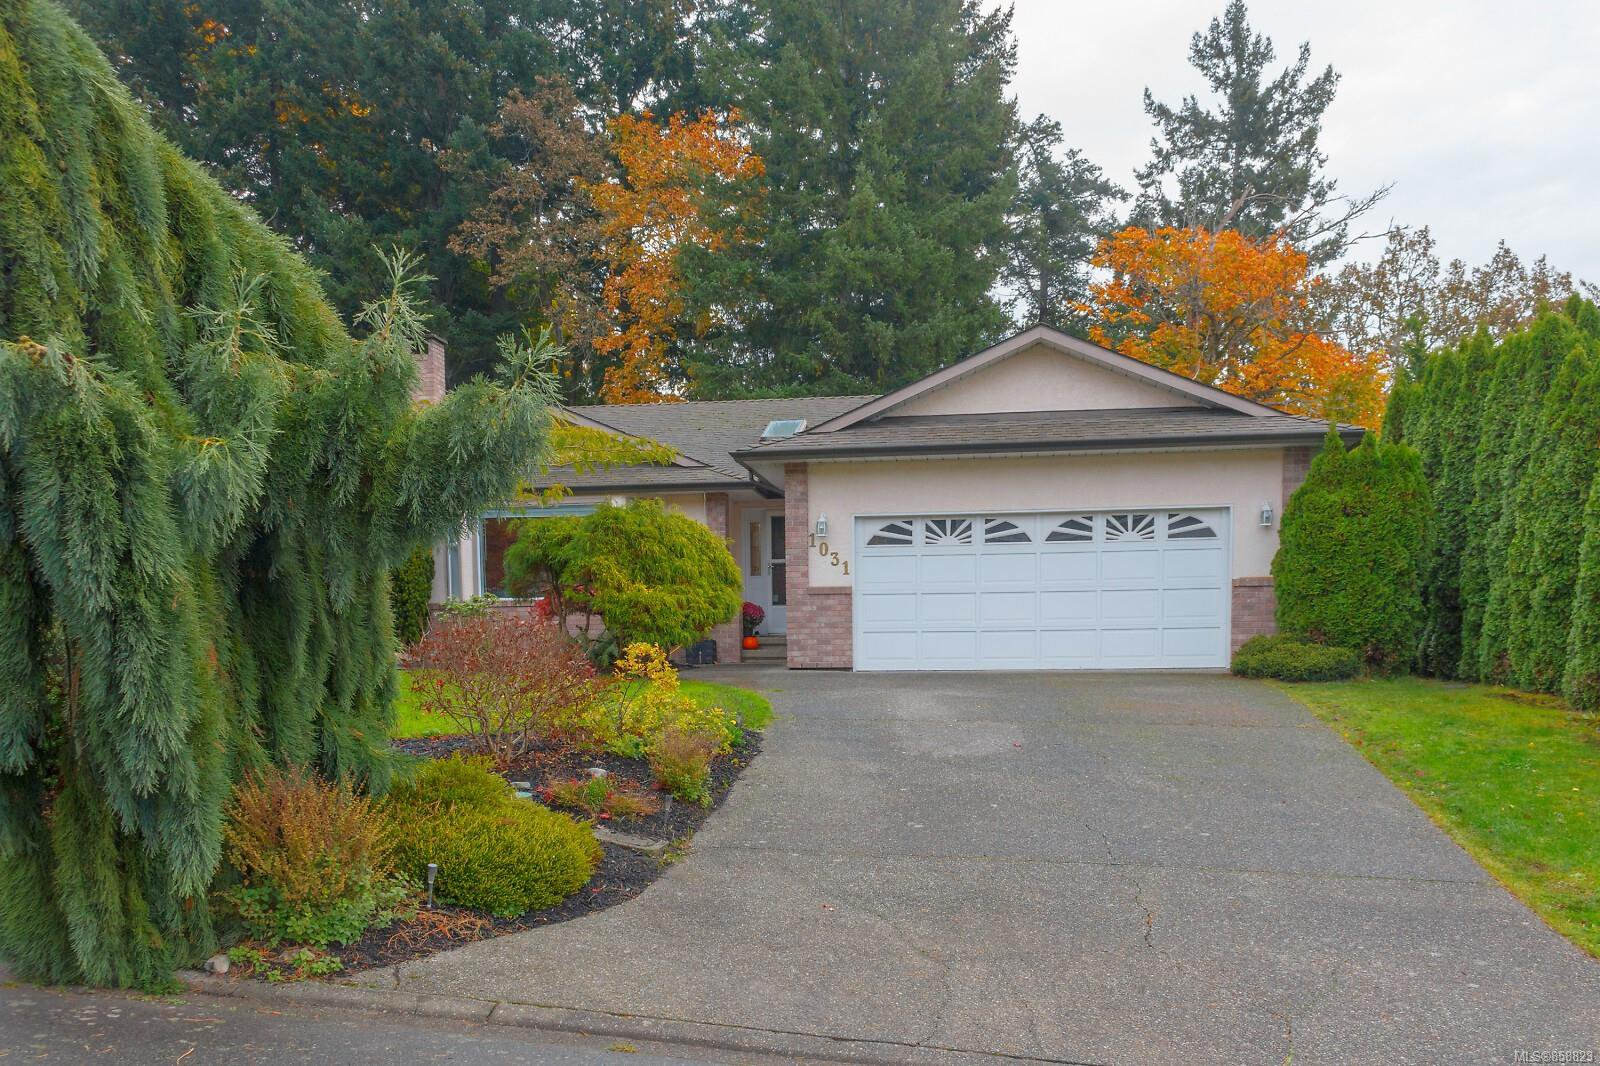 Main Photo: 1031 Adeline Pl in : SE Broadmead House for sale (Saanich East)  : MLS®# 858823